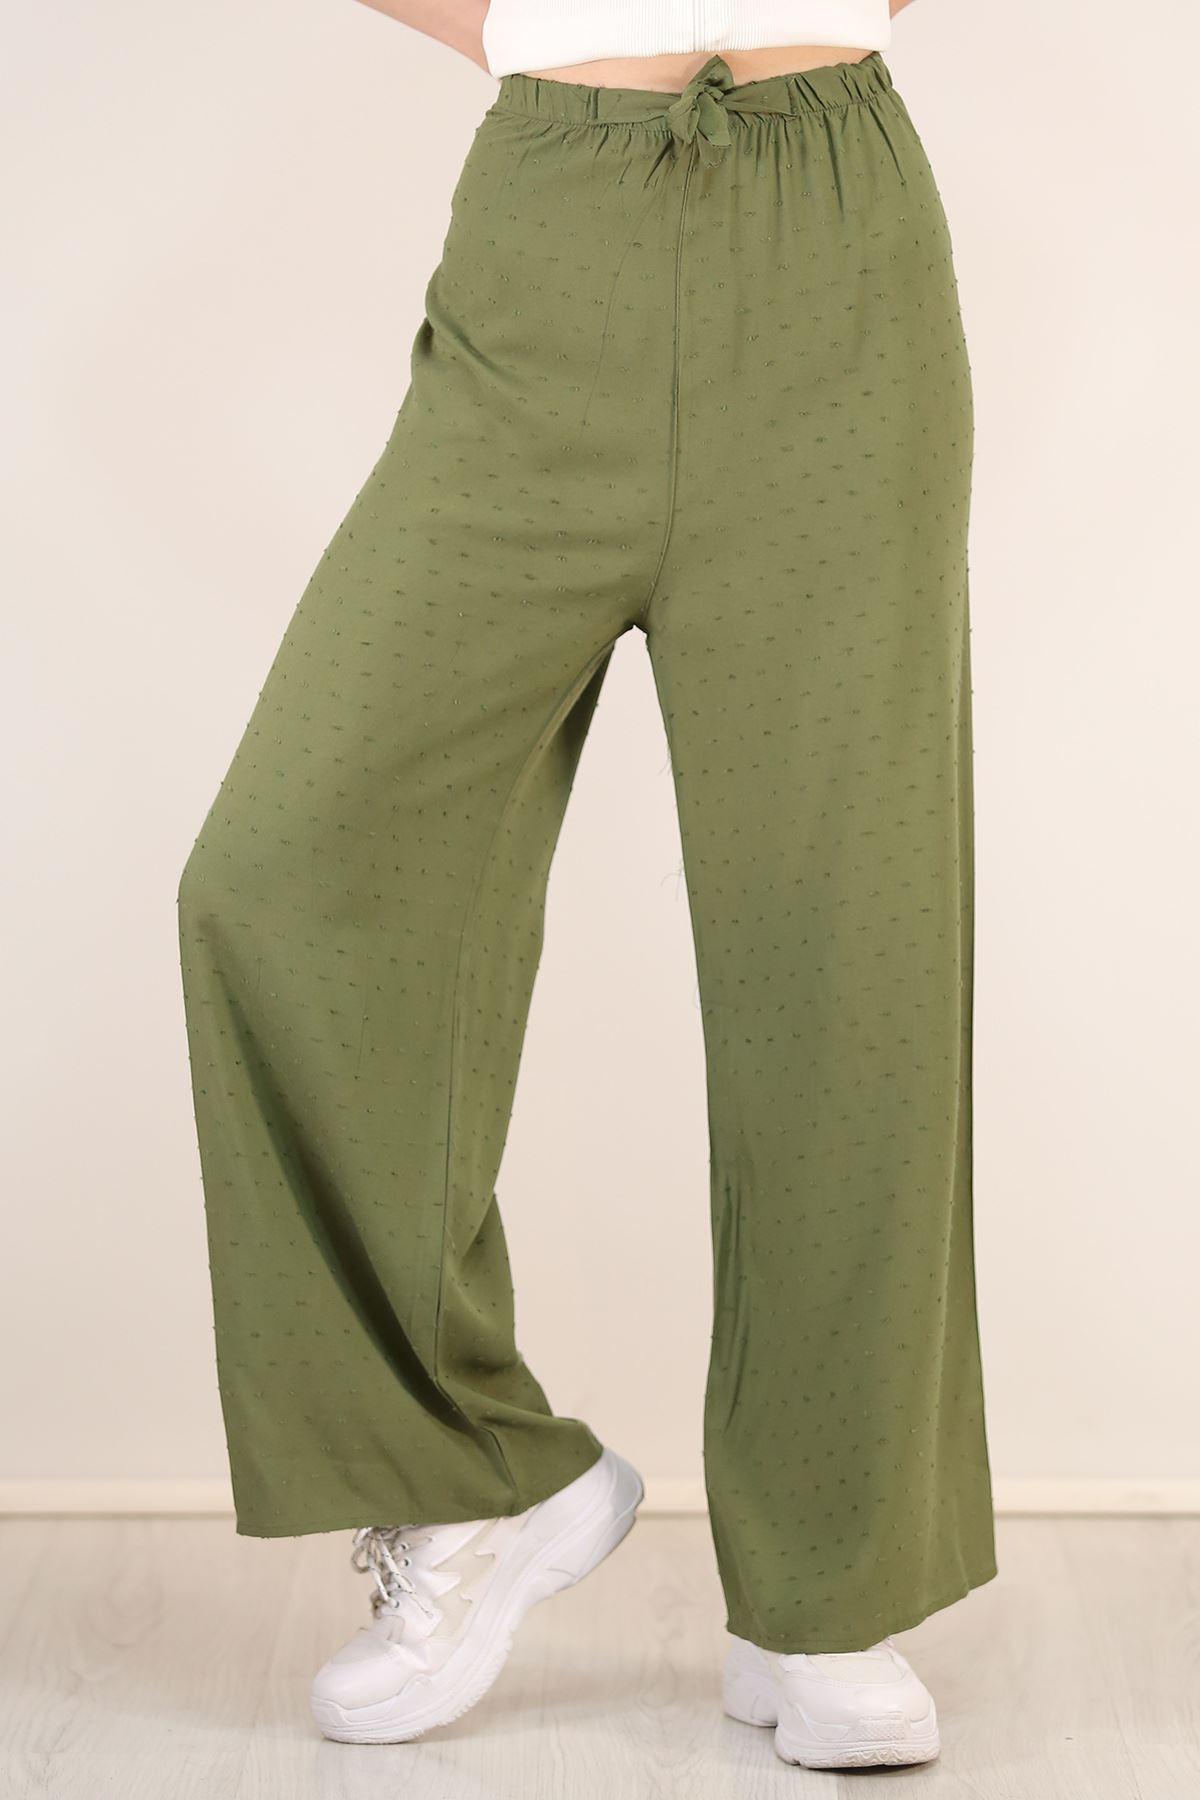 Kemerli Trend Bol Pantolon Noktalıyeşil - 0752.128. Toptan